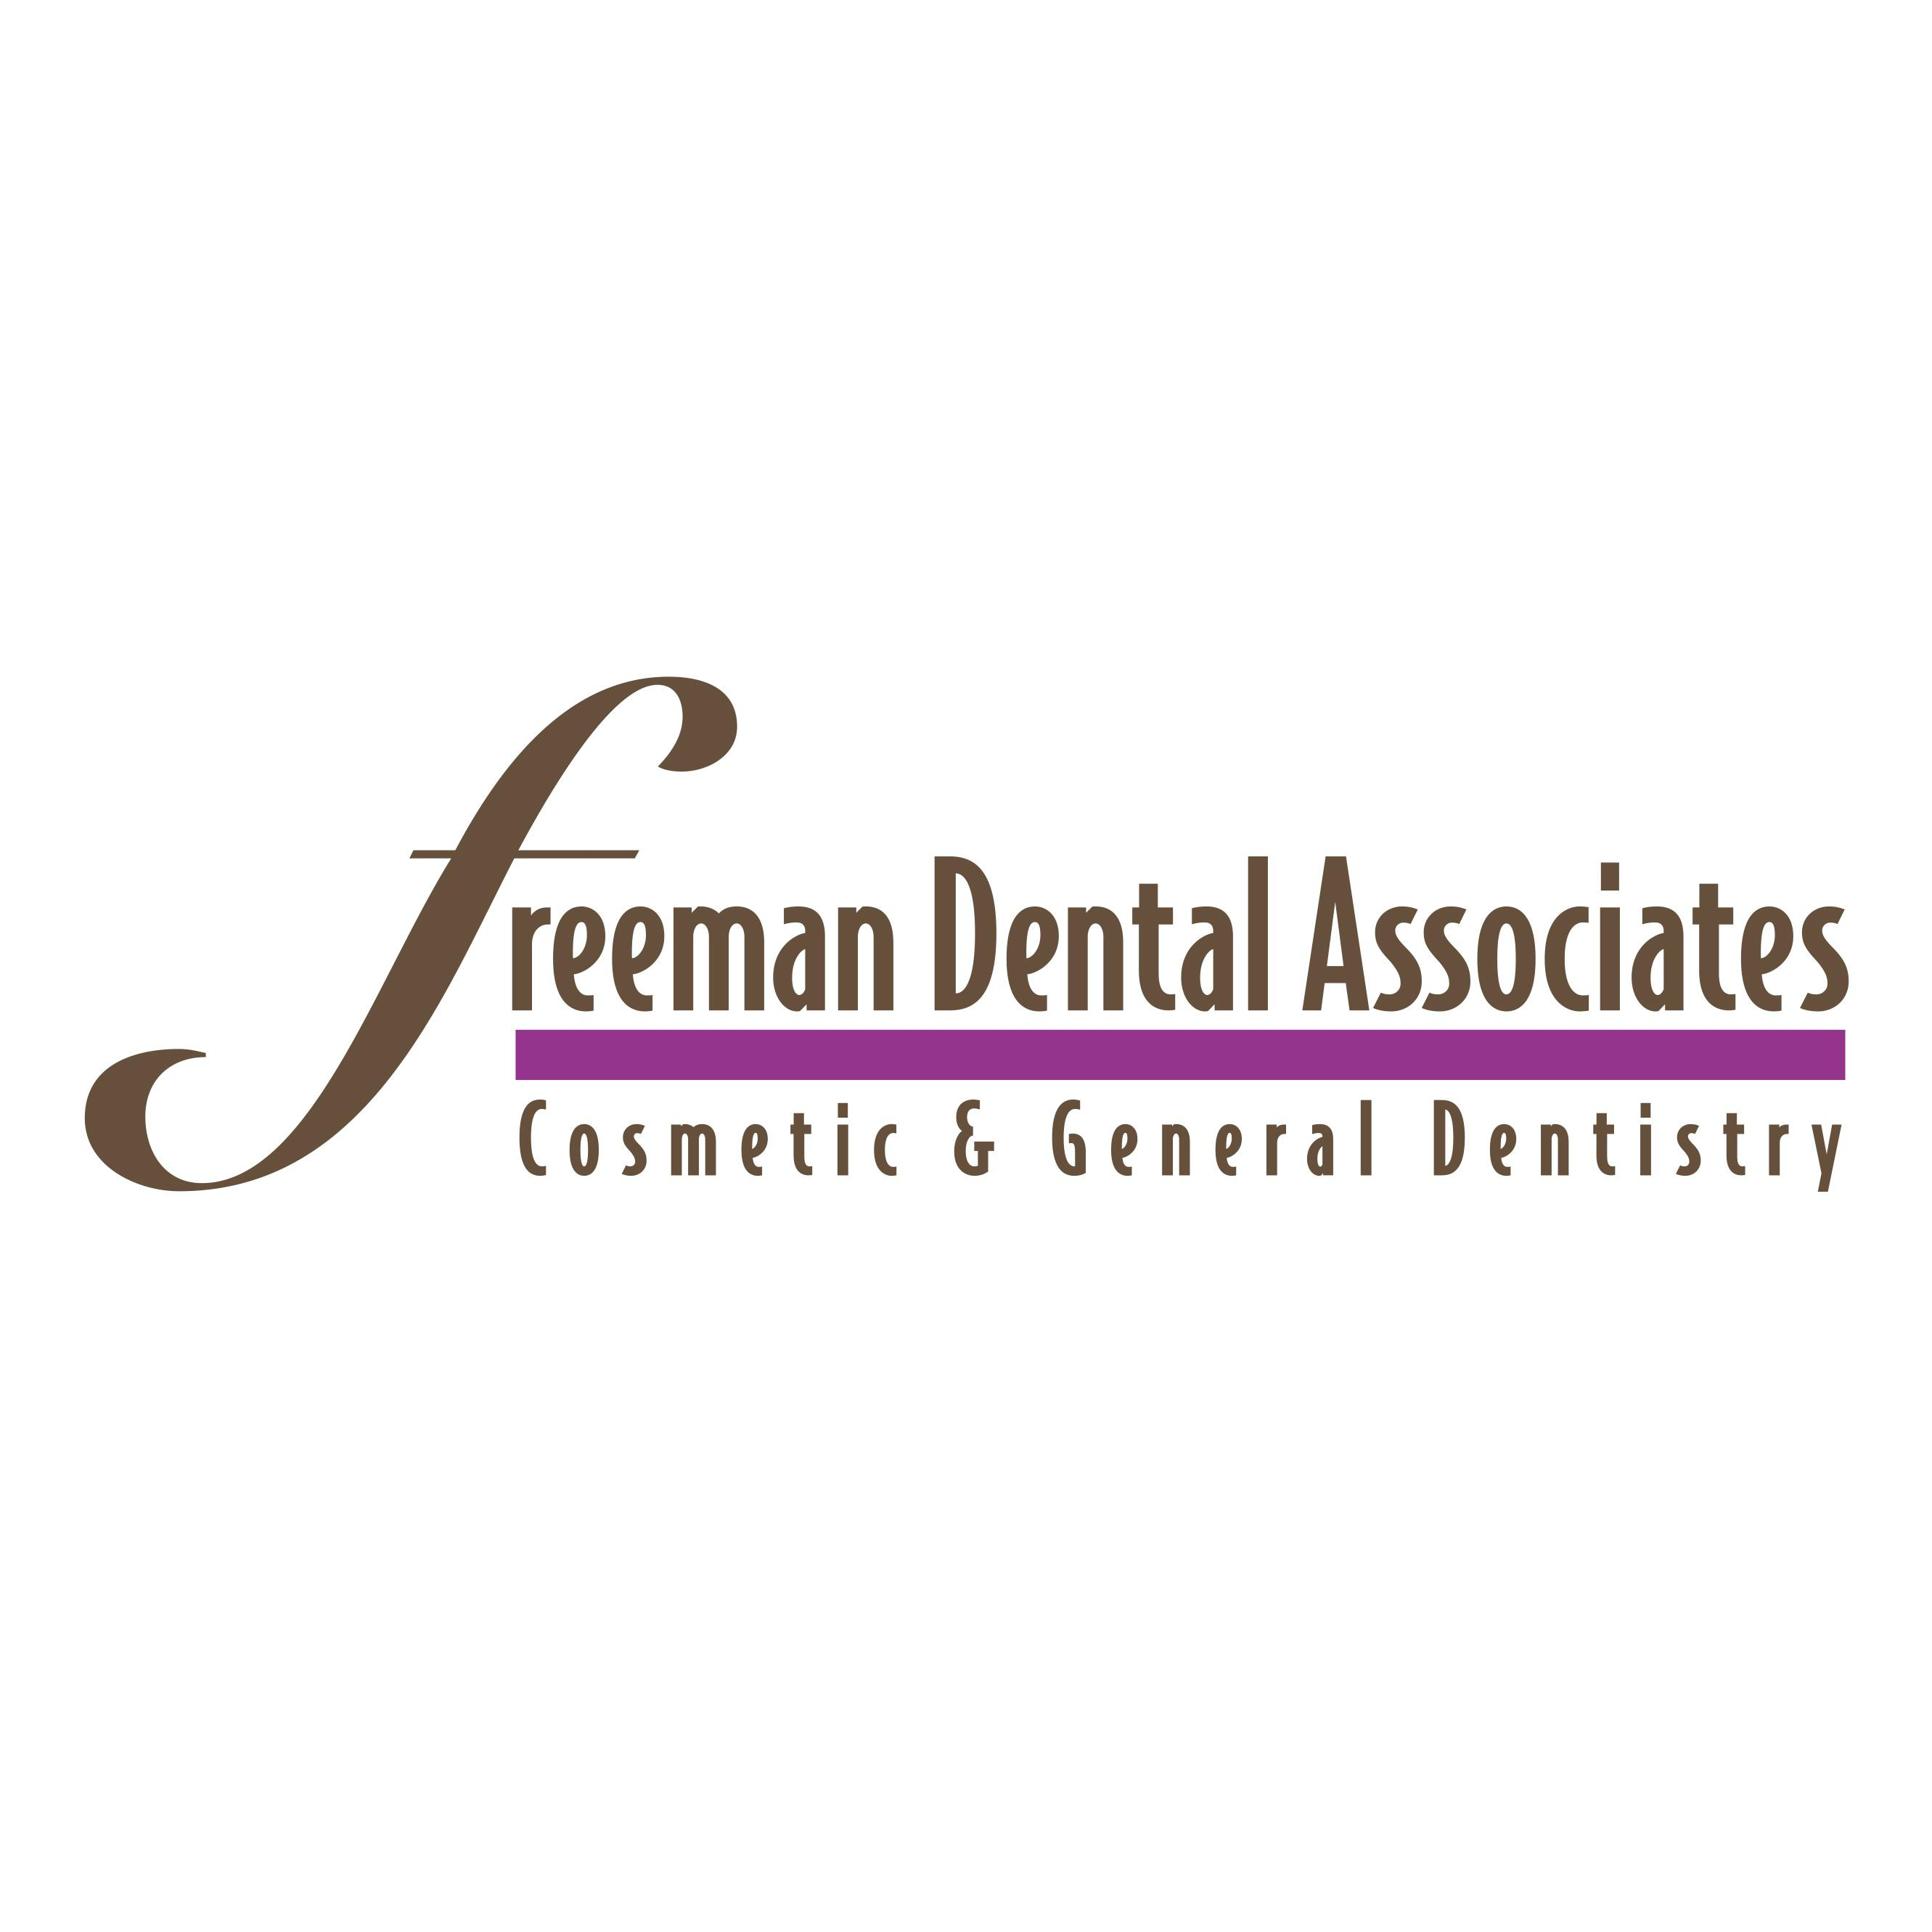 Freeman Dental Associates image 13